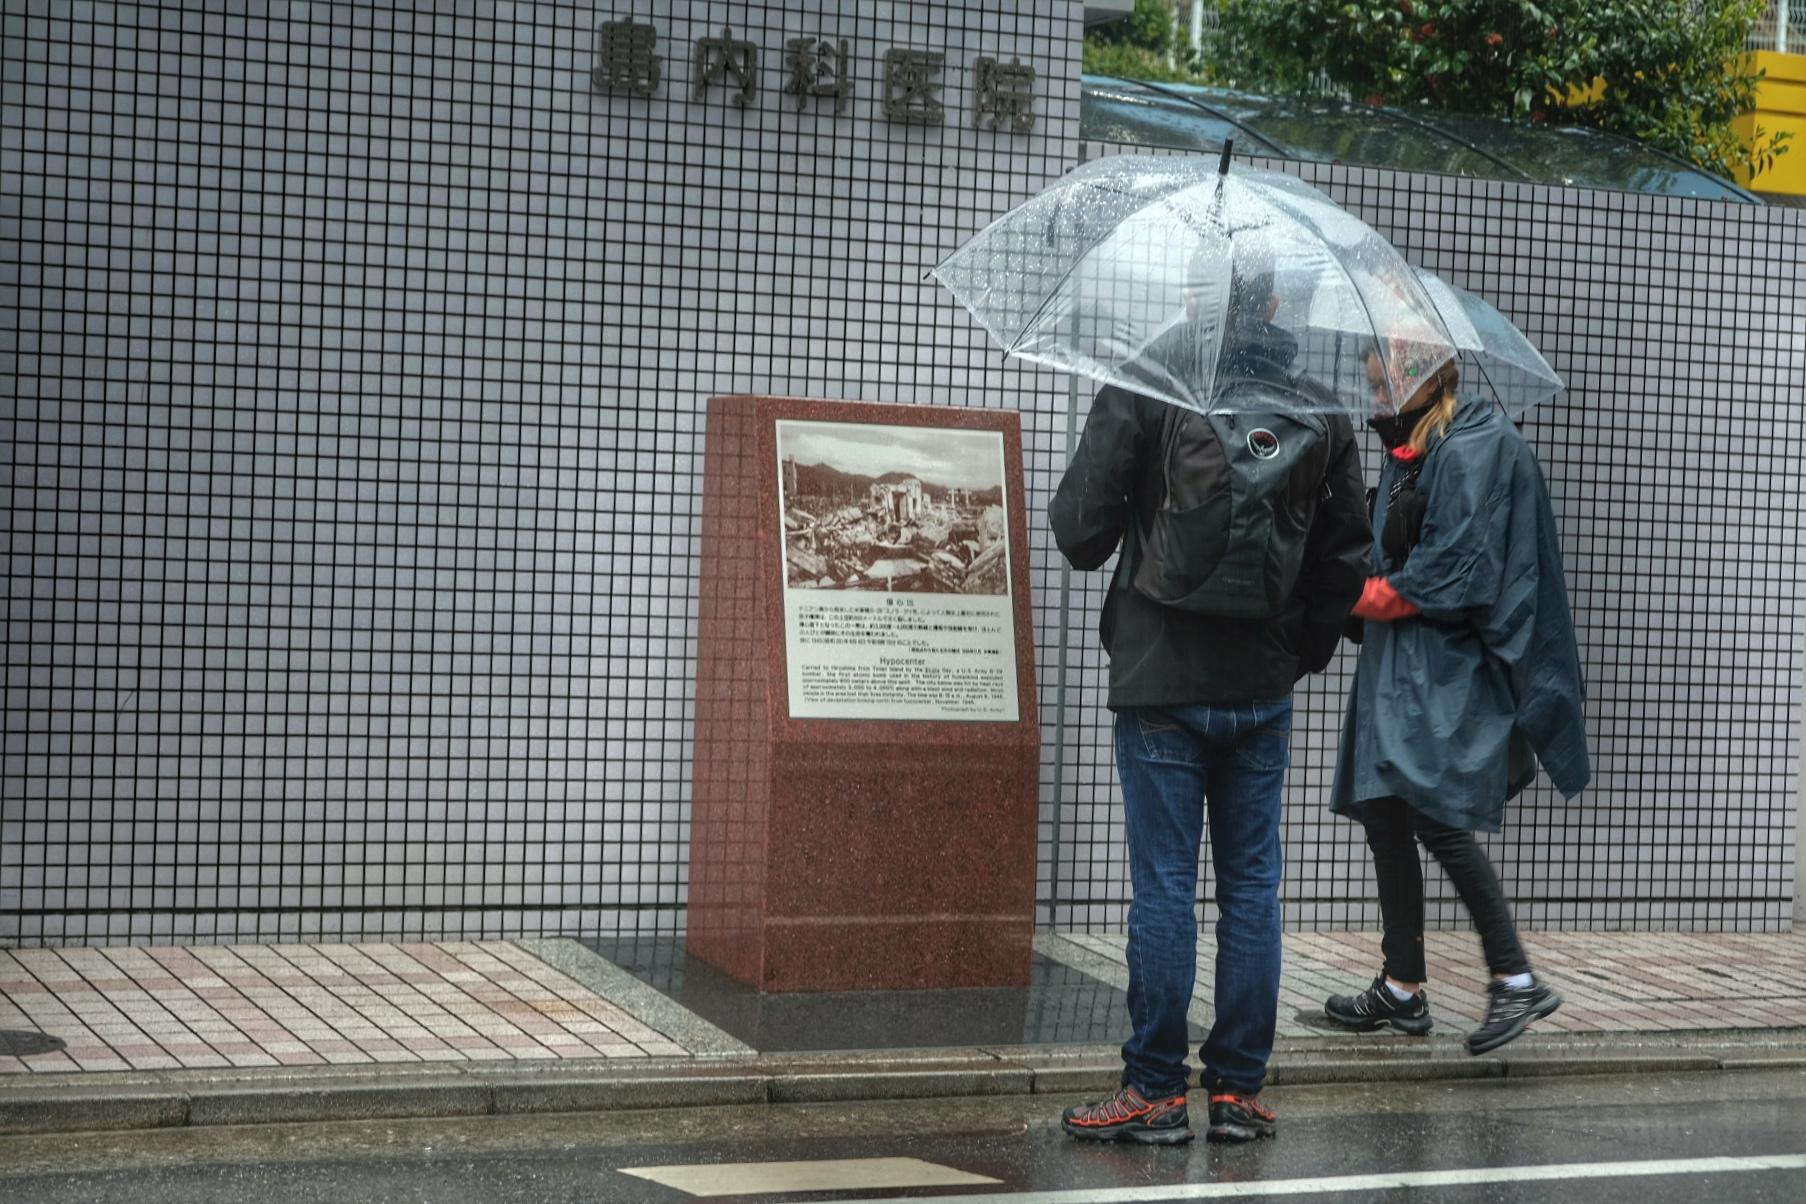 Ground zero where the atomic bomb (Little Boy) was detonated over Hiroshima